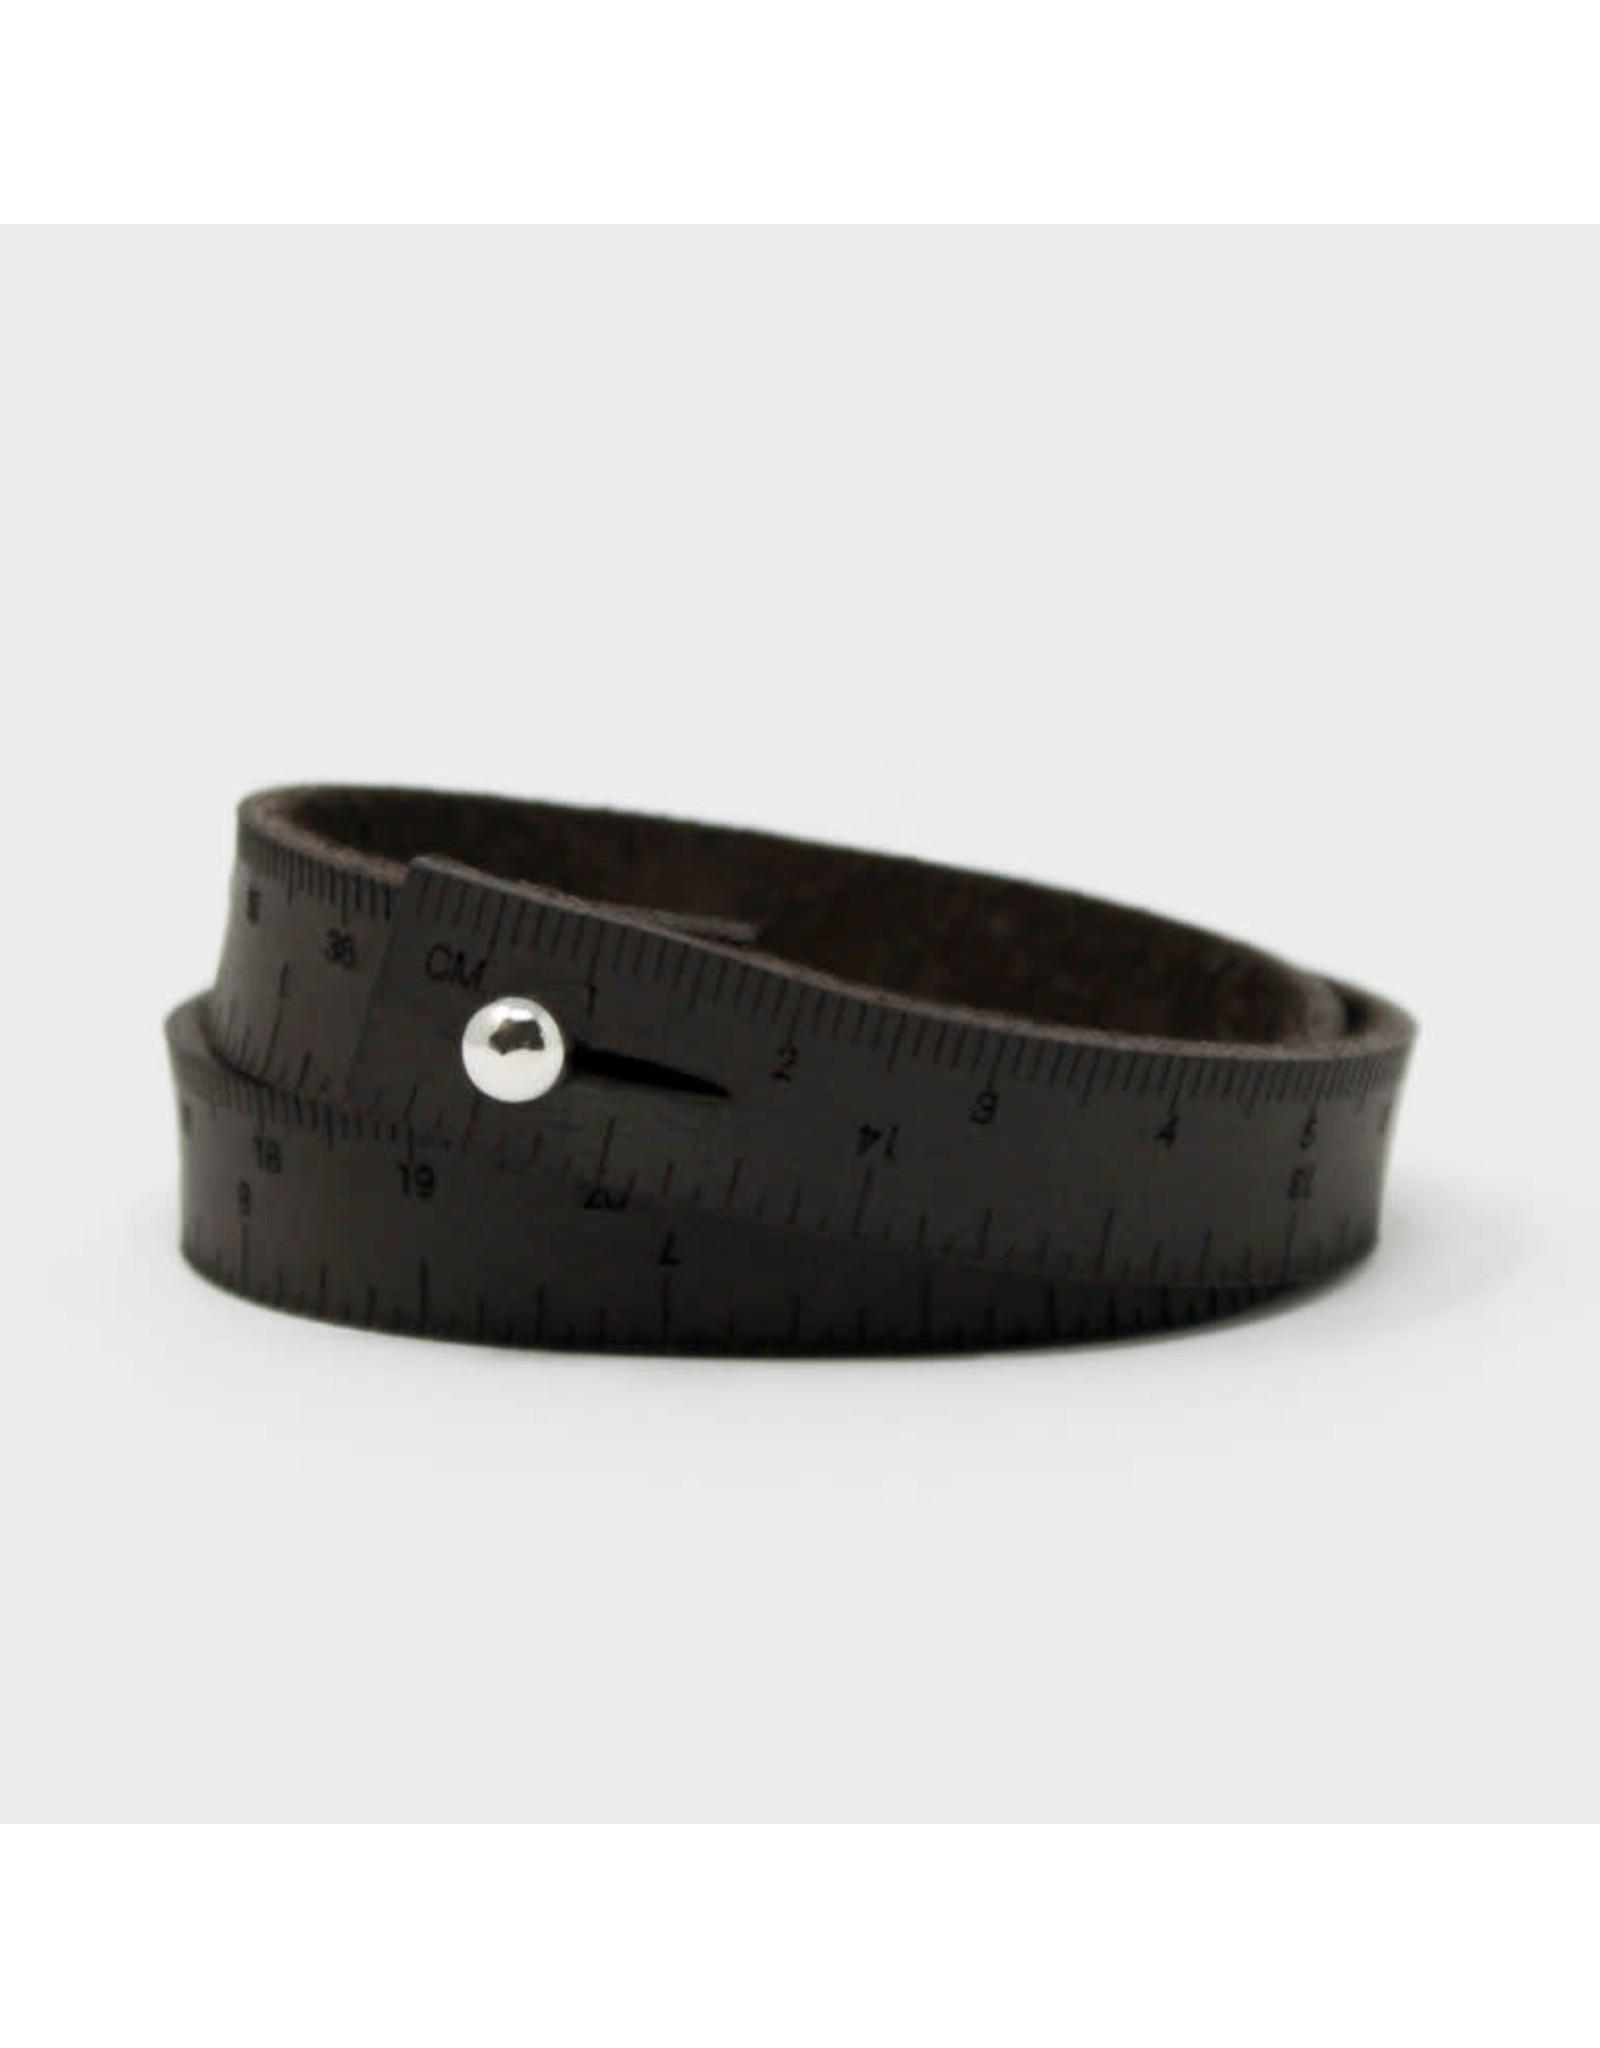 Wrist Ruler - DARK BROWN - 16 inches